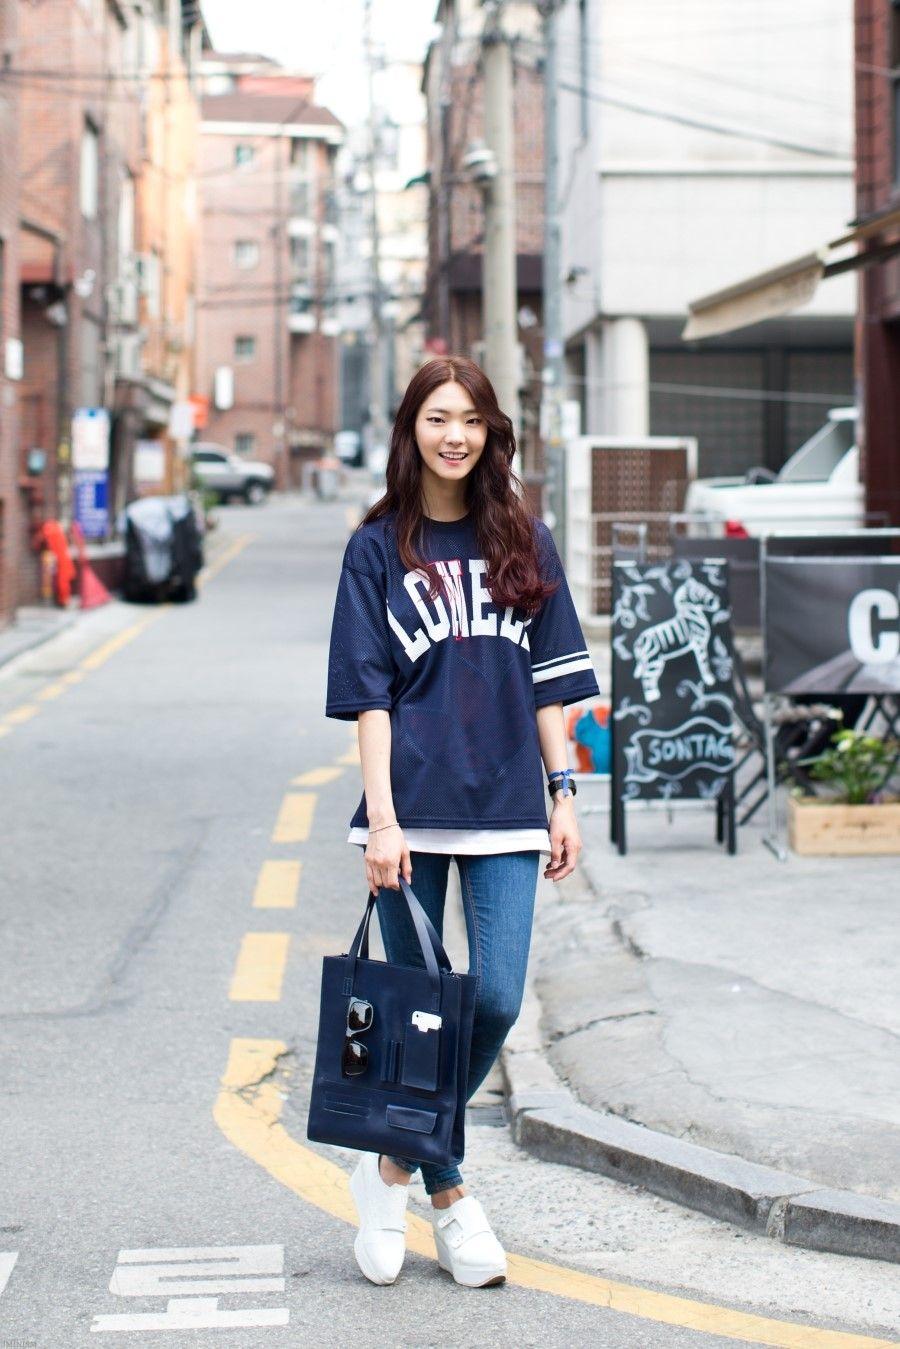 Korean Fashion Clothing Style for Teenage Girls 2014 | I ... |Korean Street Fashion 2014 For Girls